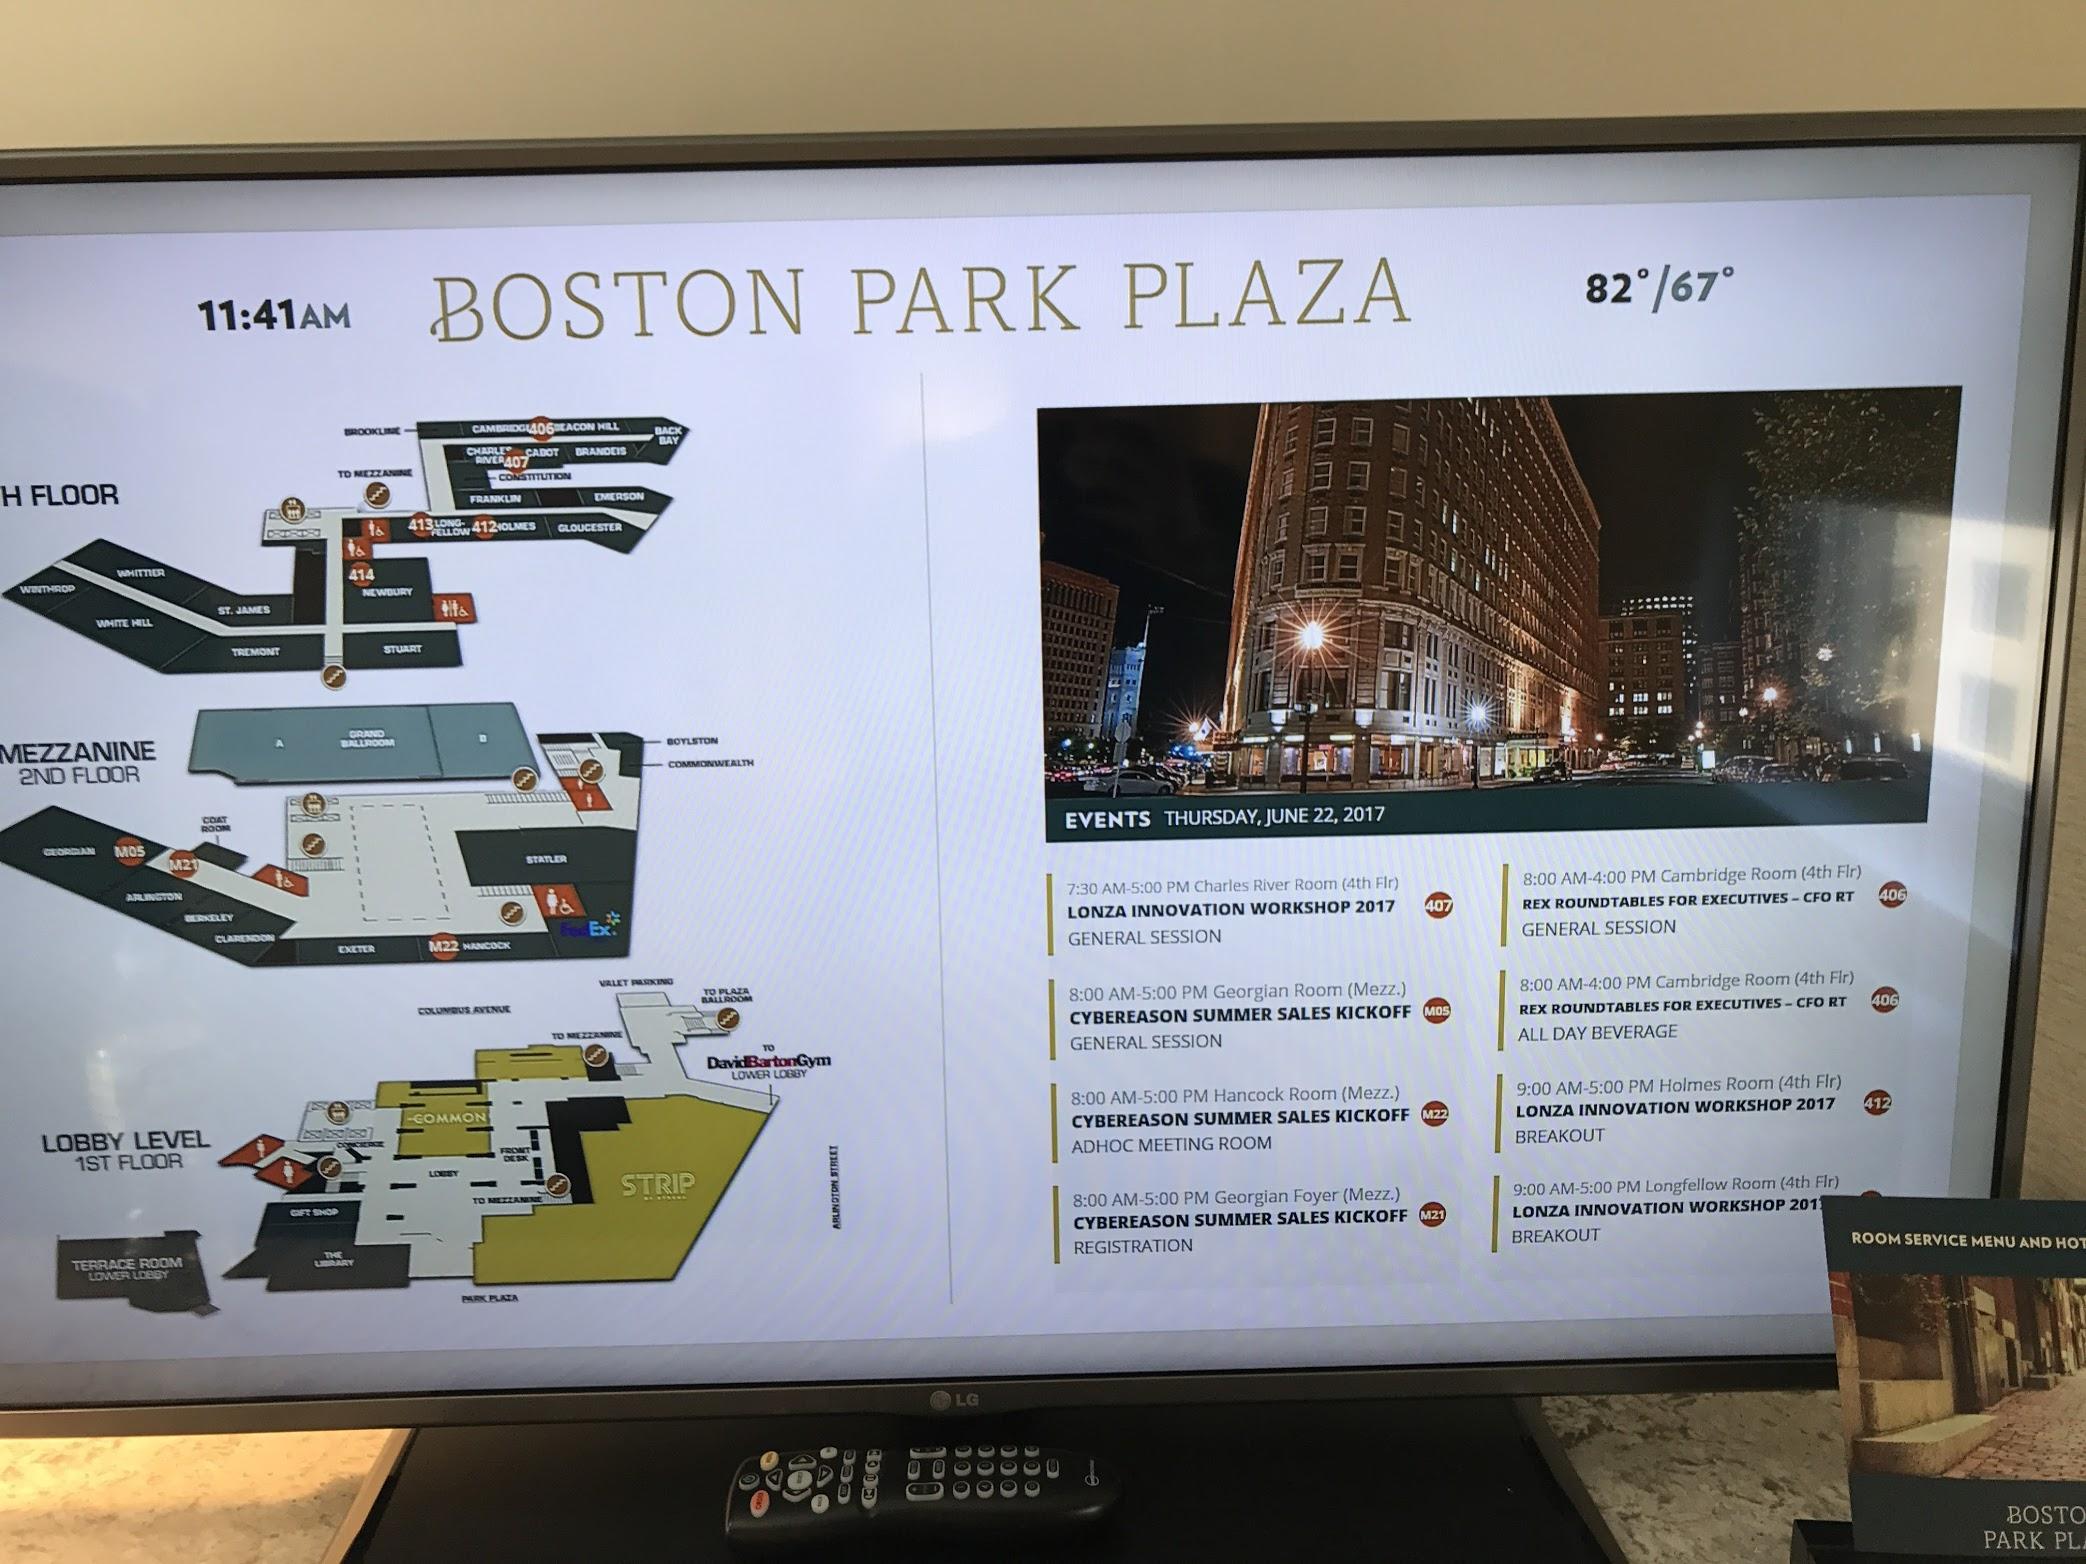 Boston Park Plaza Tv Screens.jpg